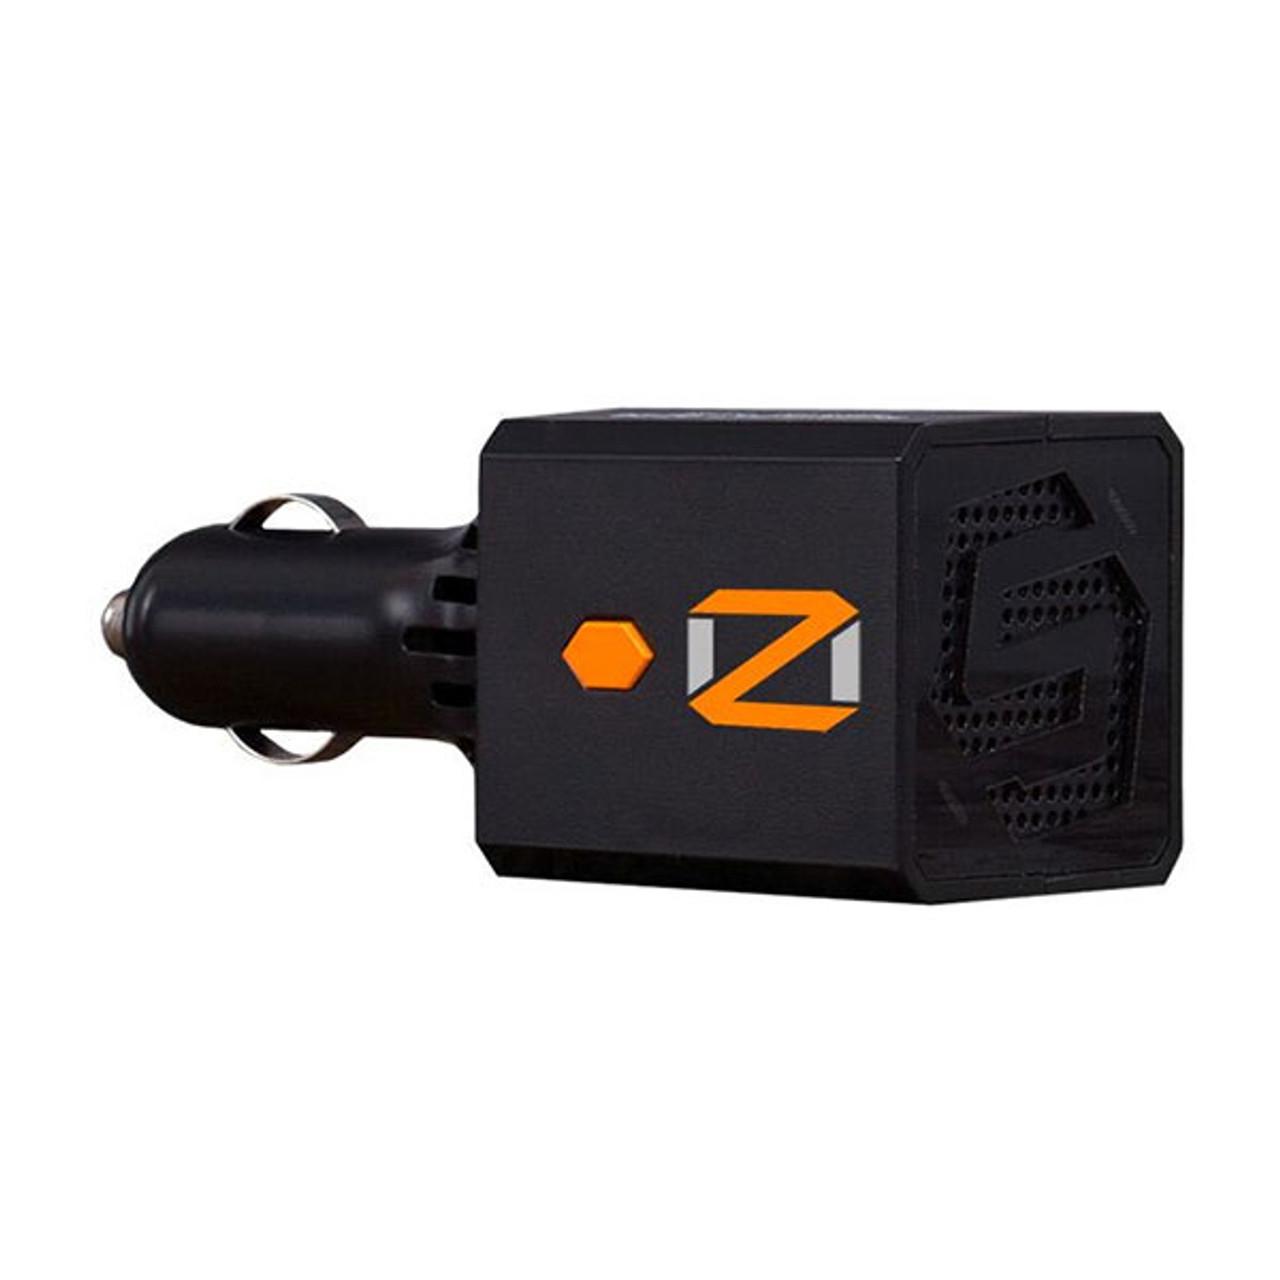 ScentLok OZ20HD Vehicle Deodorizer